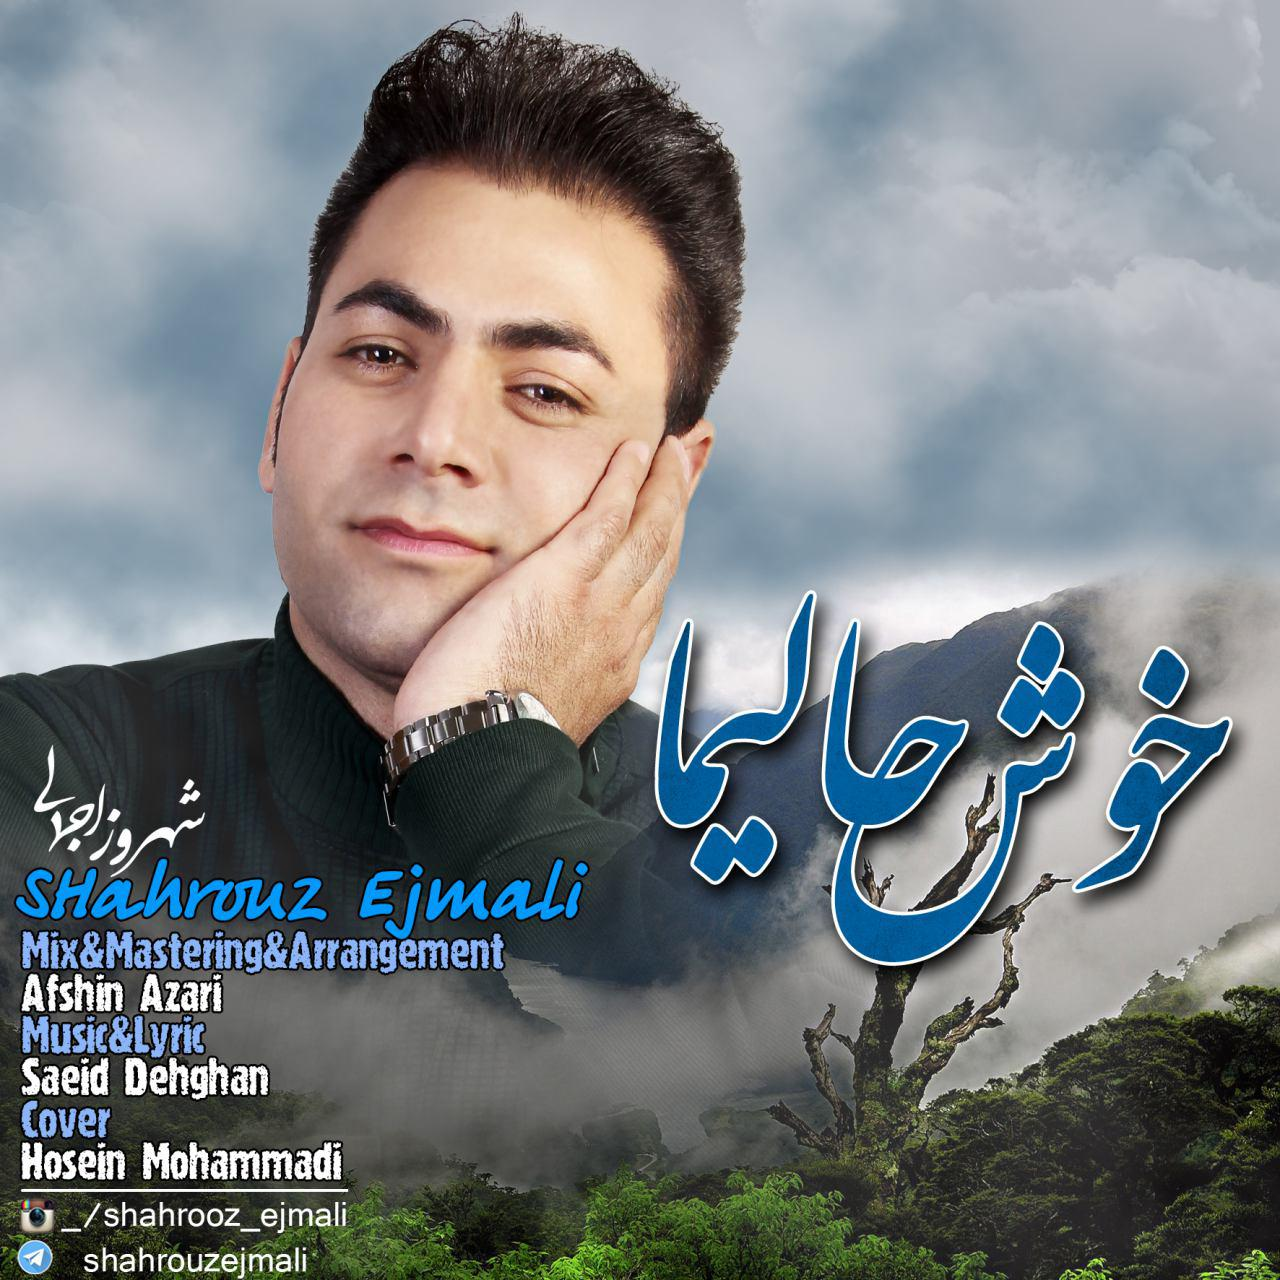 http://s6.picofile.com/file/8246083576/Shahrouz_Ejmali_Khosh_Halima.jpg